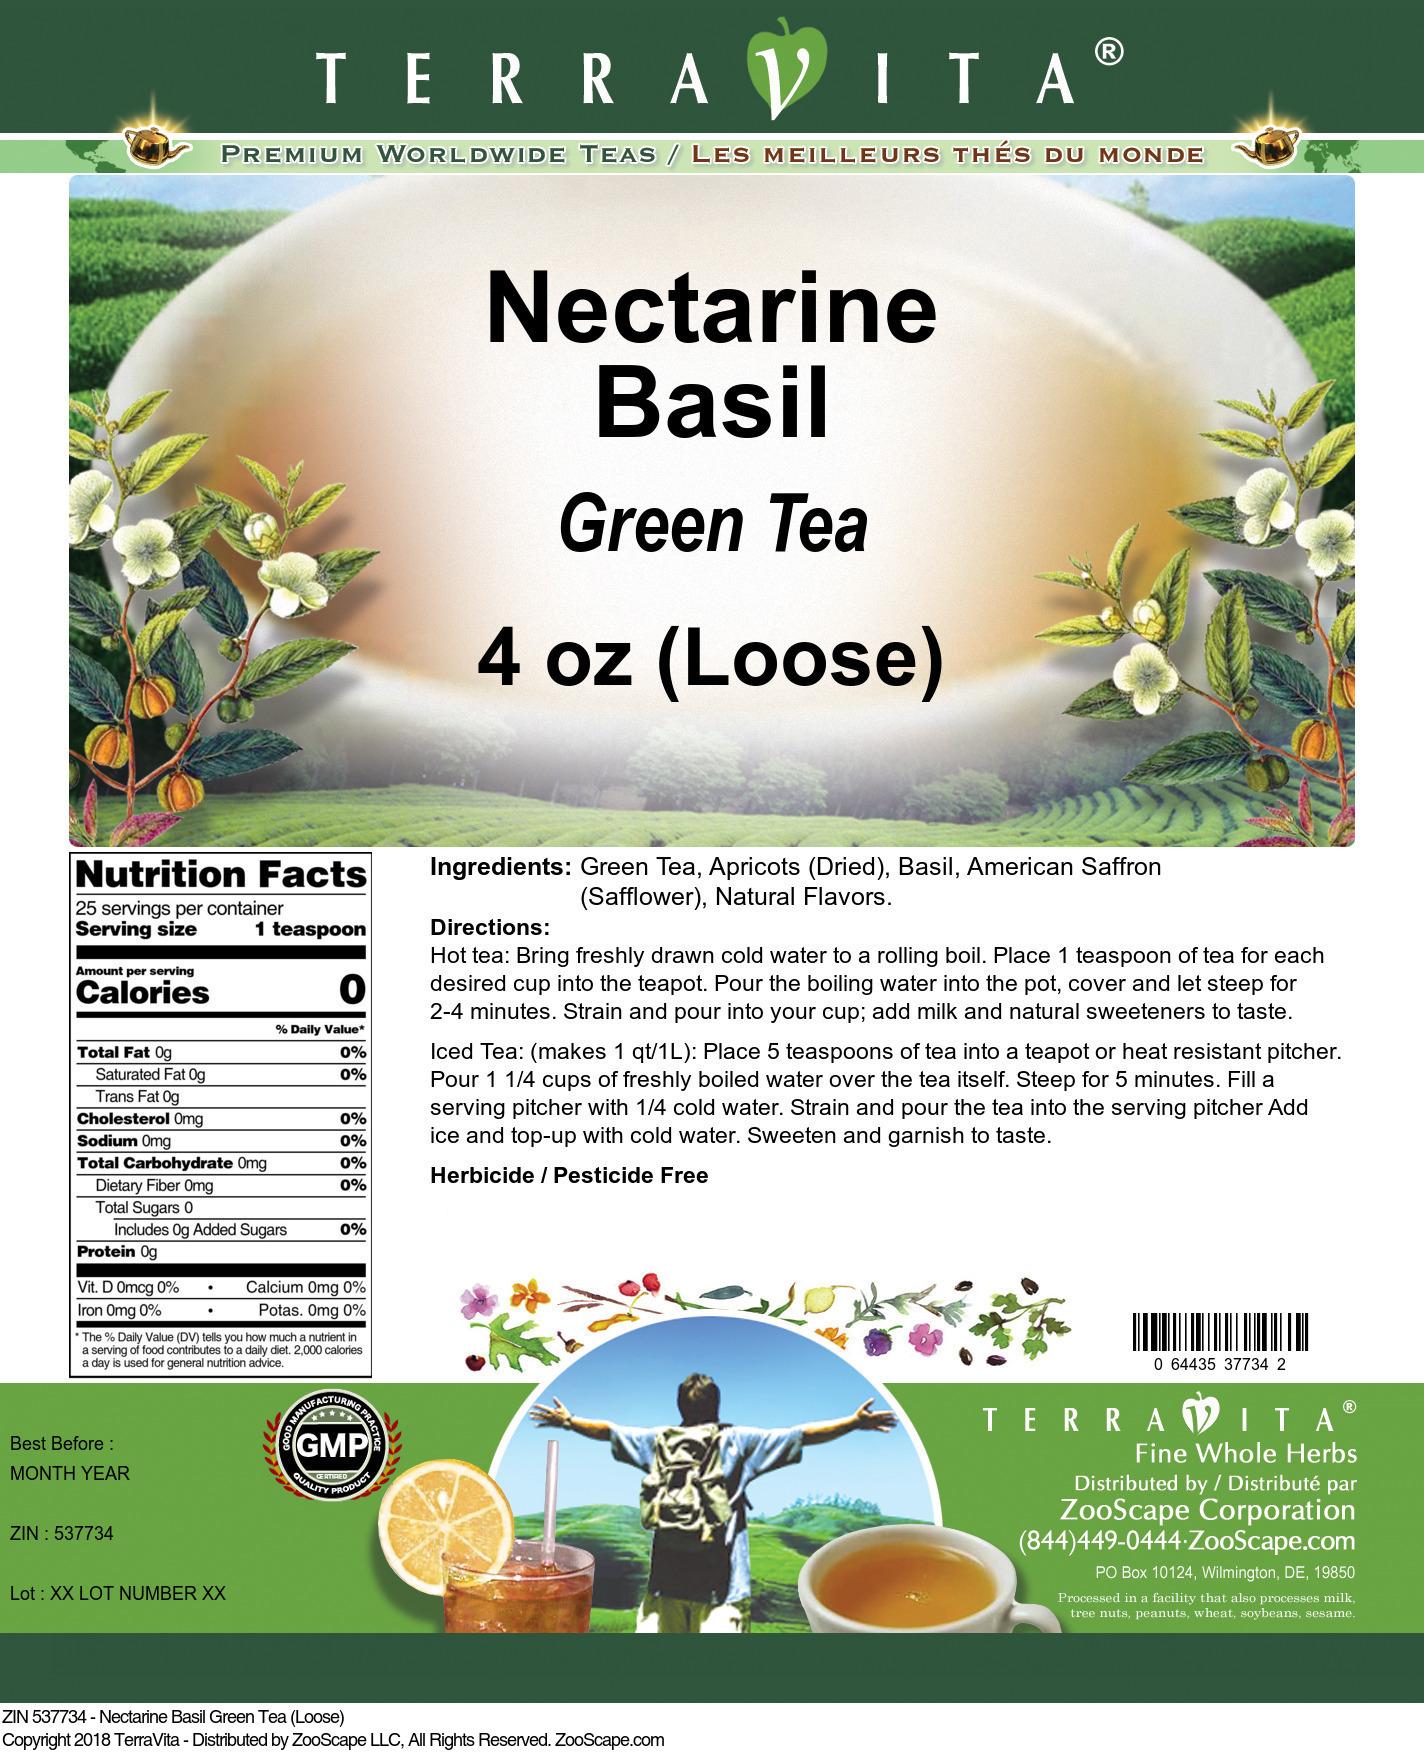 Nectarine Basil Green Tea (Loose)